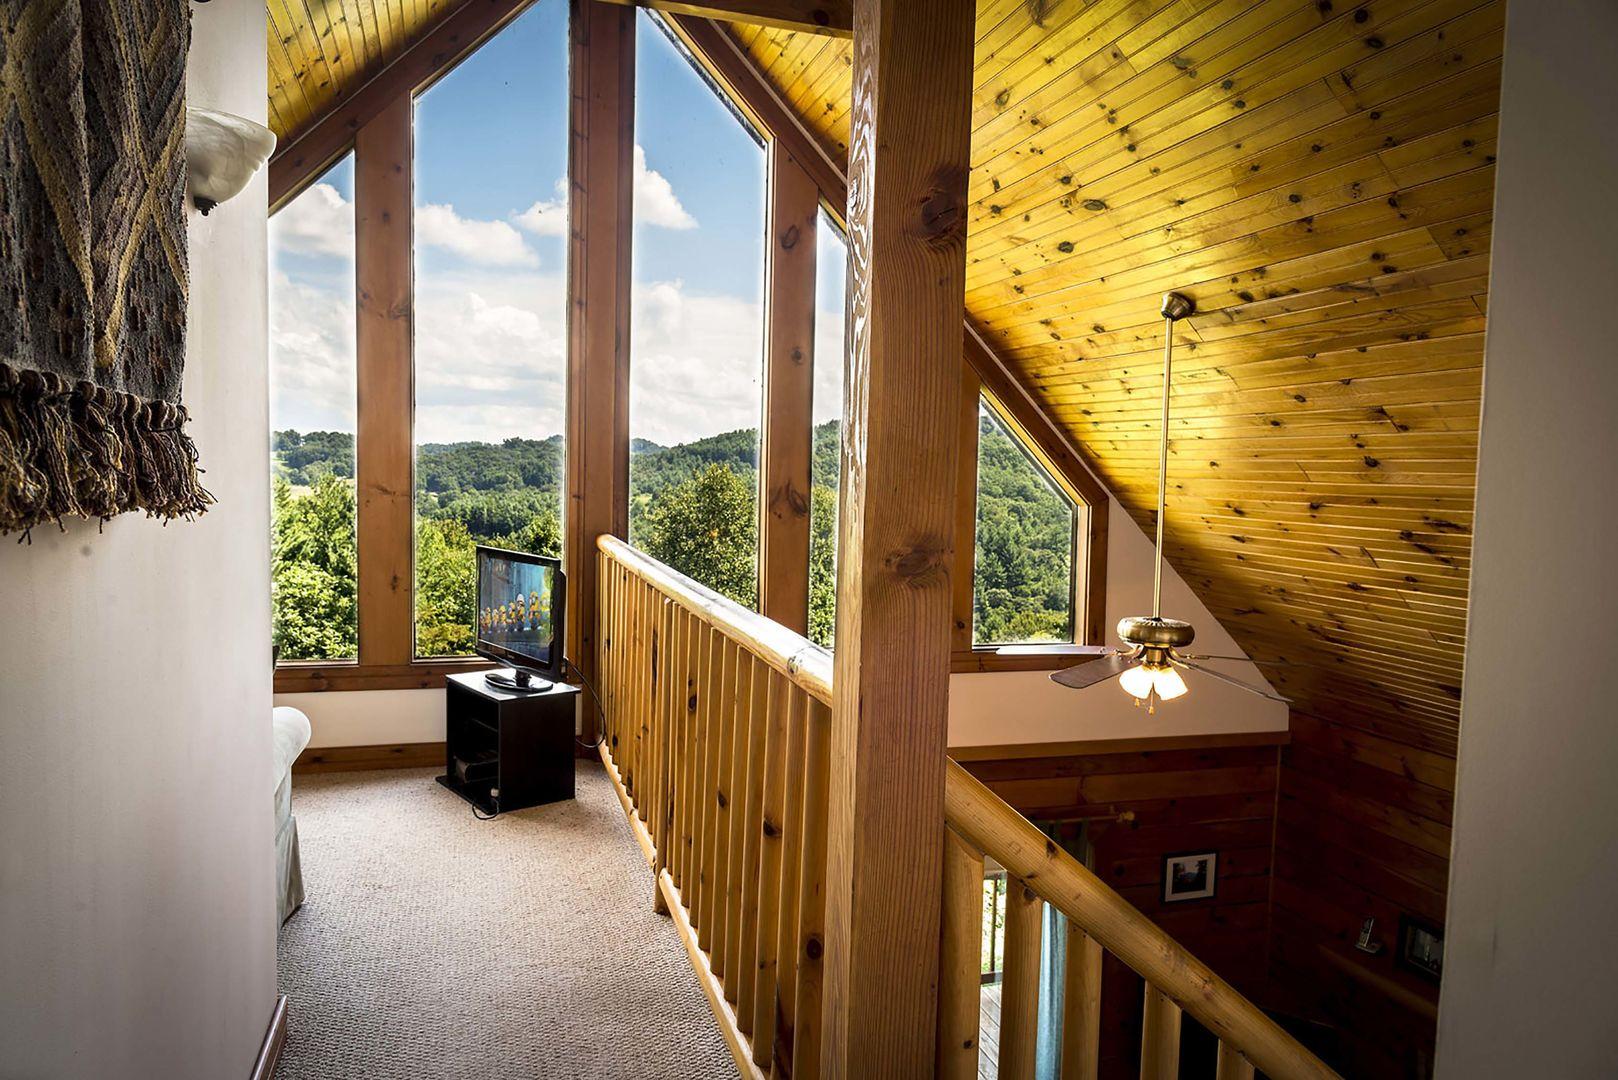 Upstairs loft with triangular windows